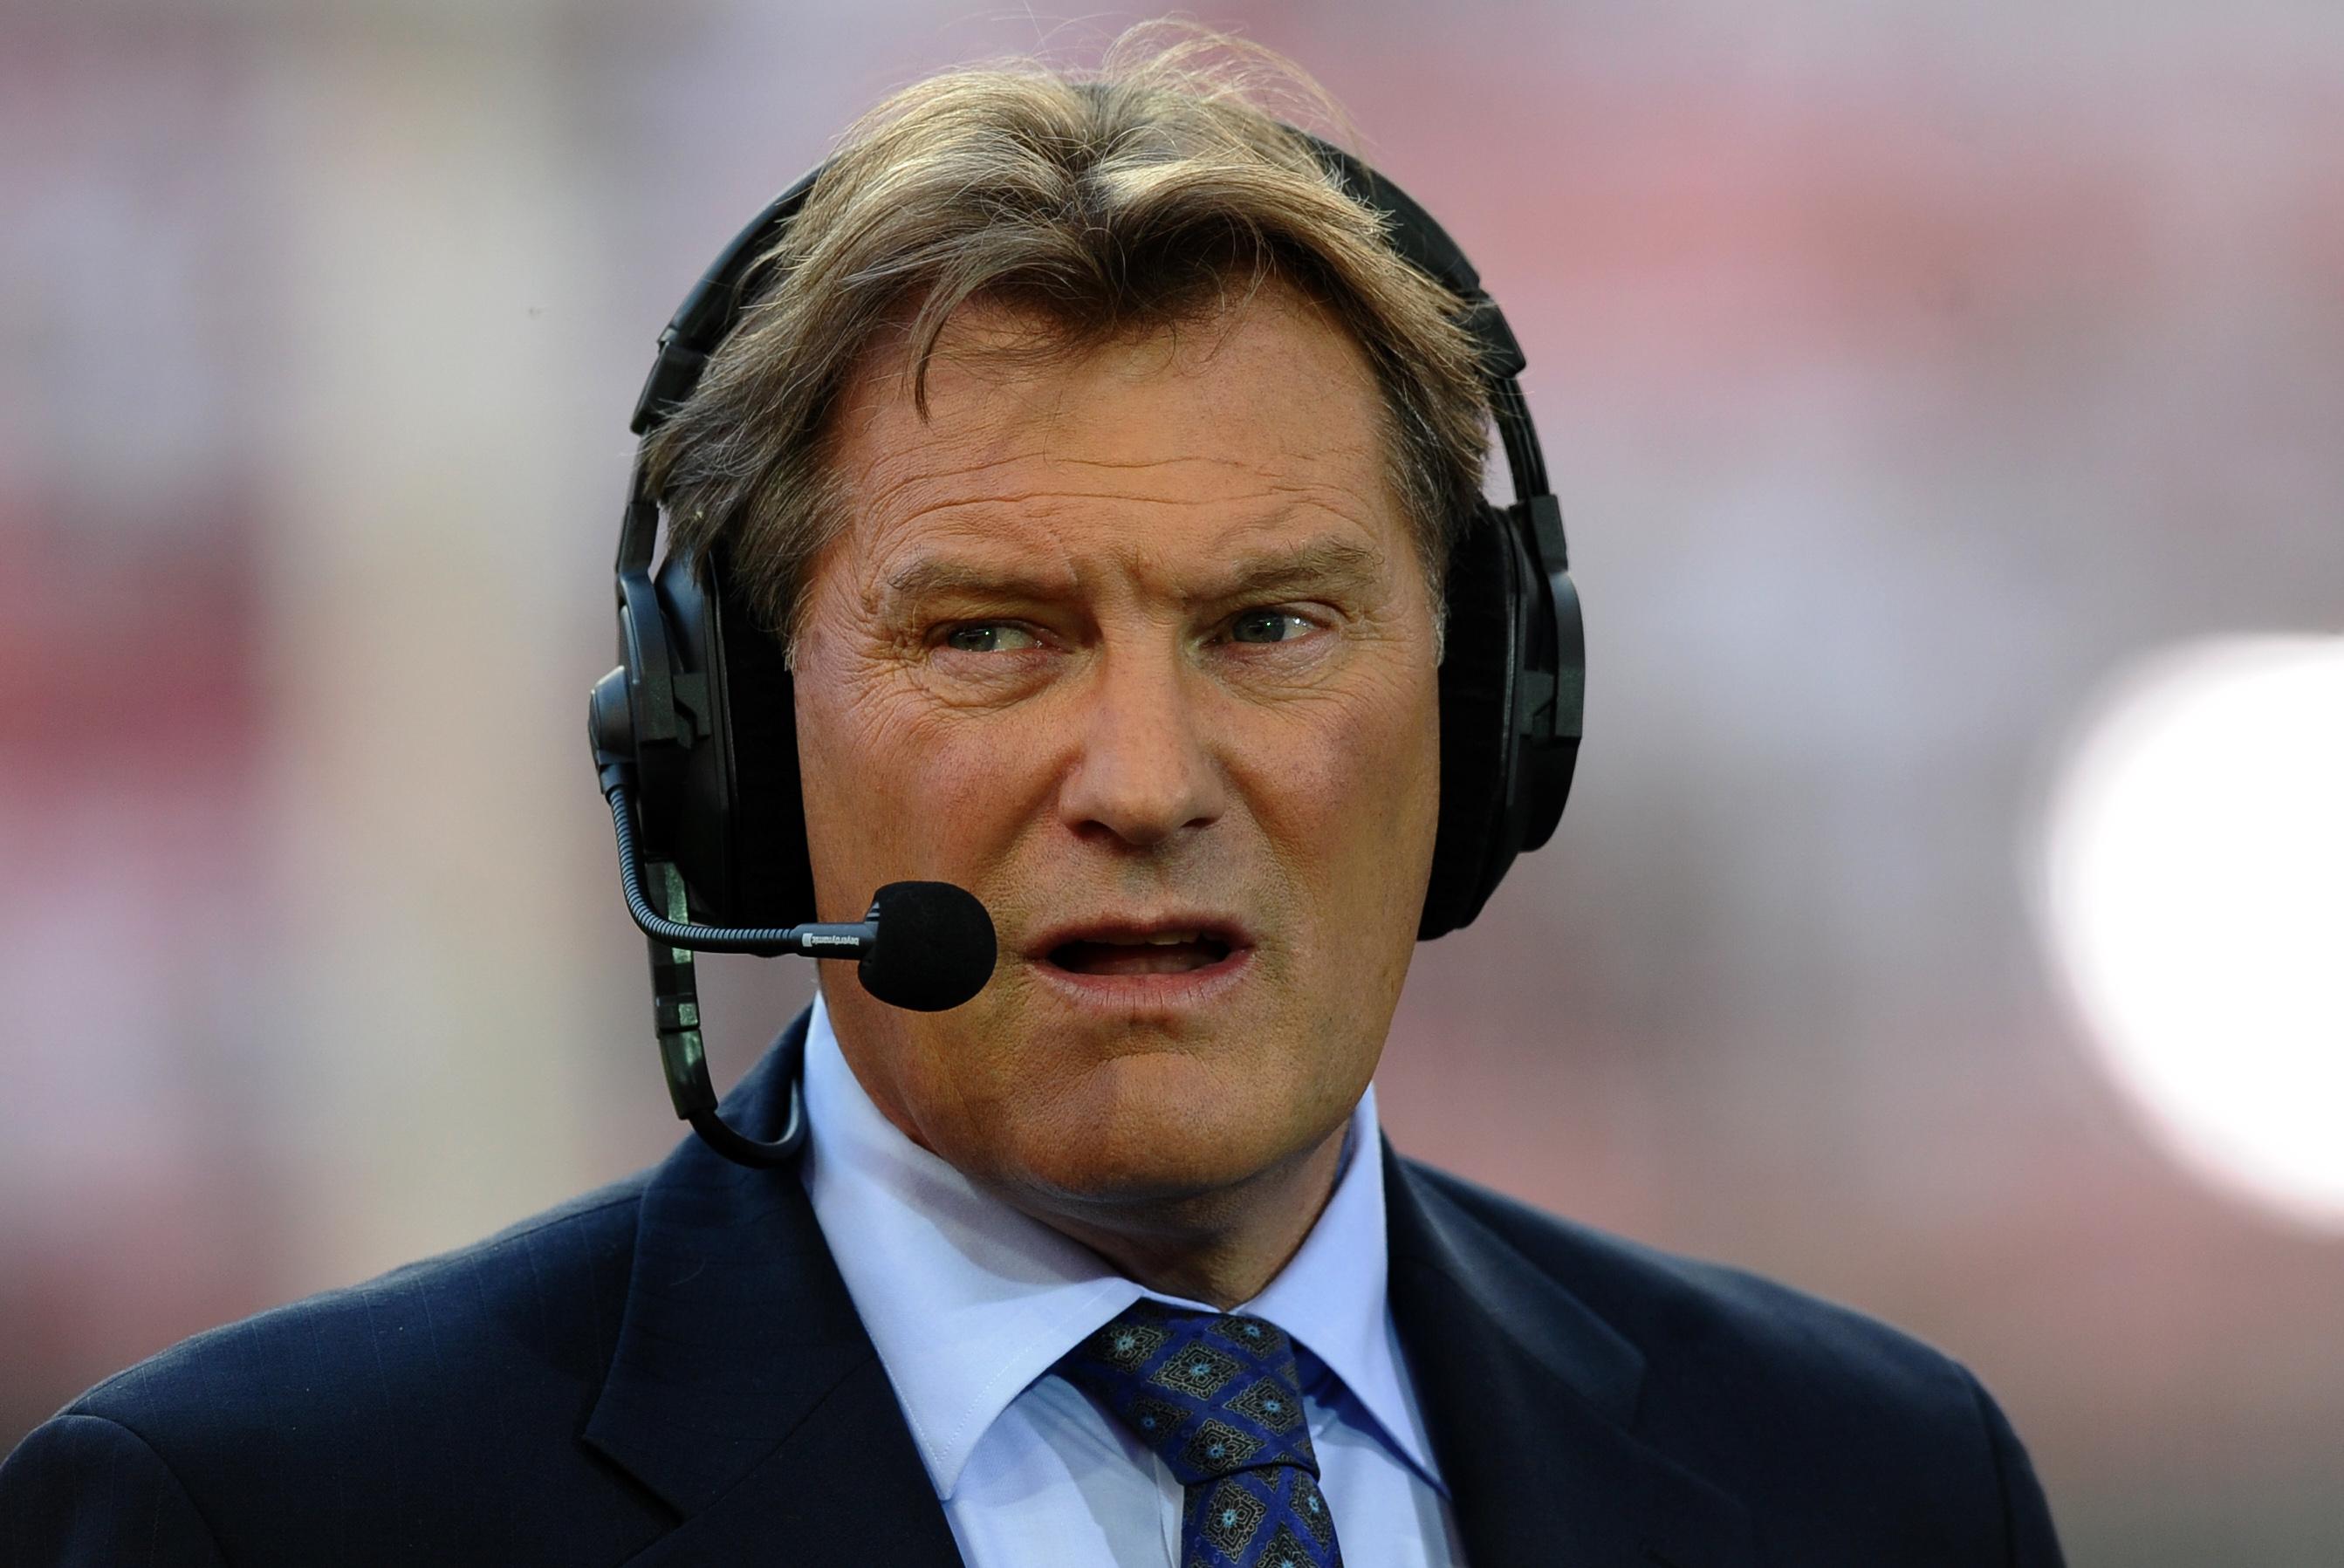 Glenn Hoddle welcomes Greg Dyke's push to overhaul English football